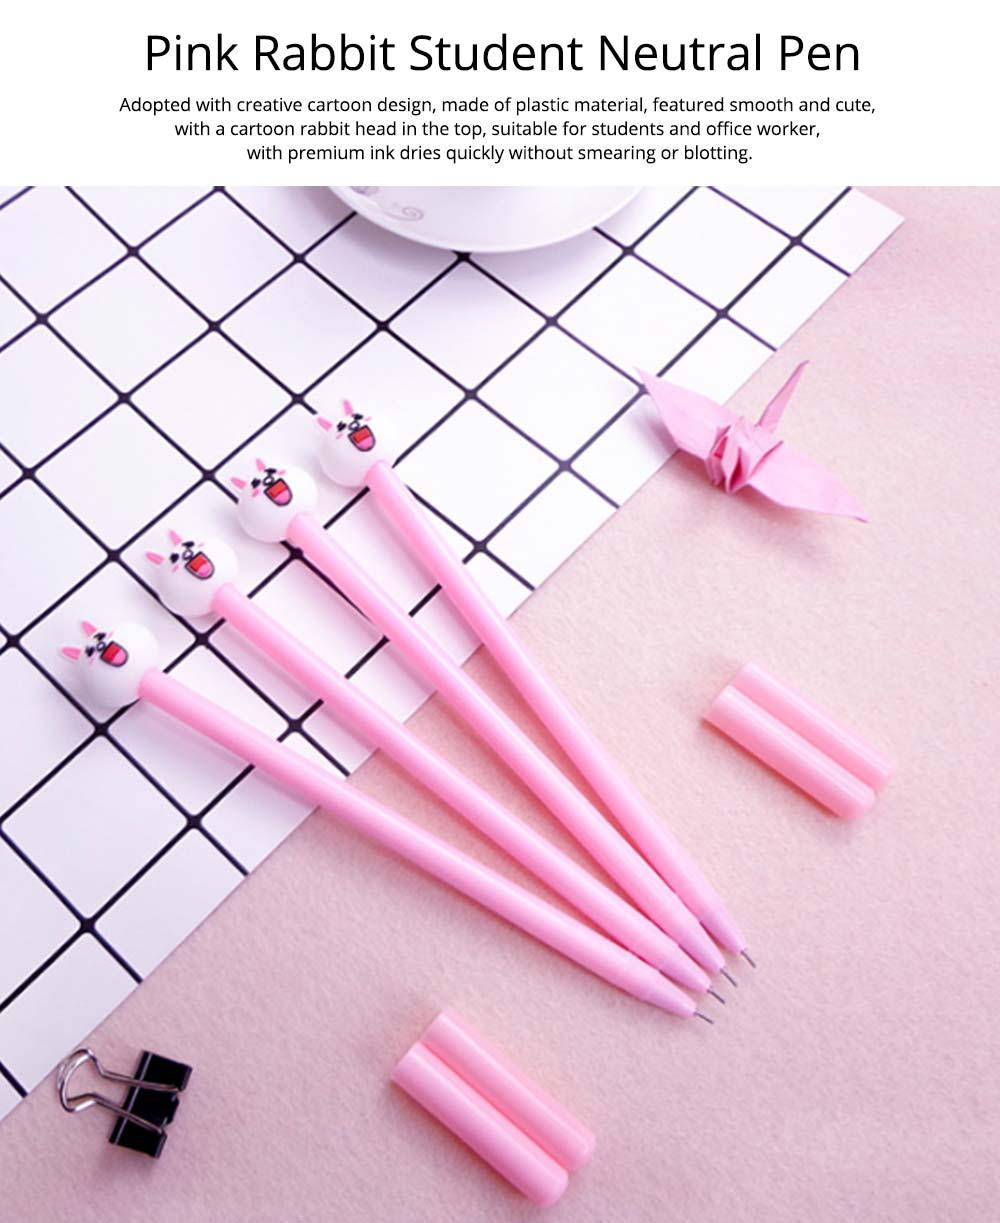 Cute Gel Pen - Cartoon Rabbit Neutral Pen Black,  0.38mm 7